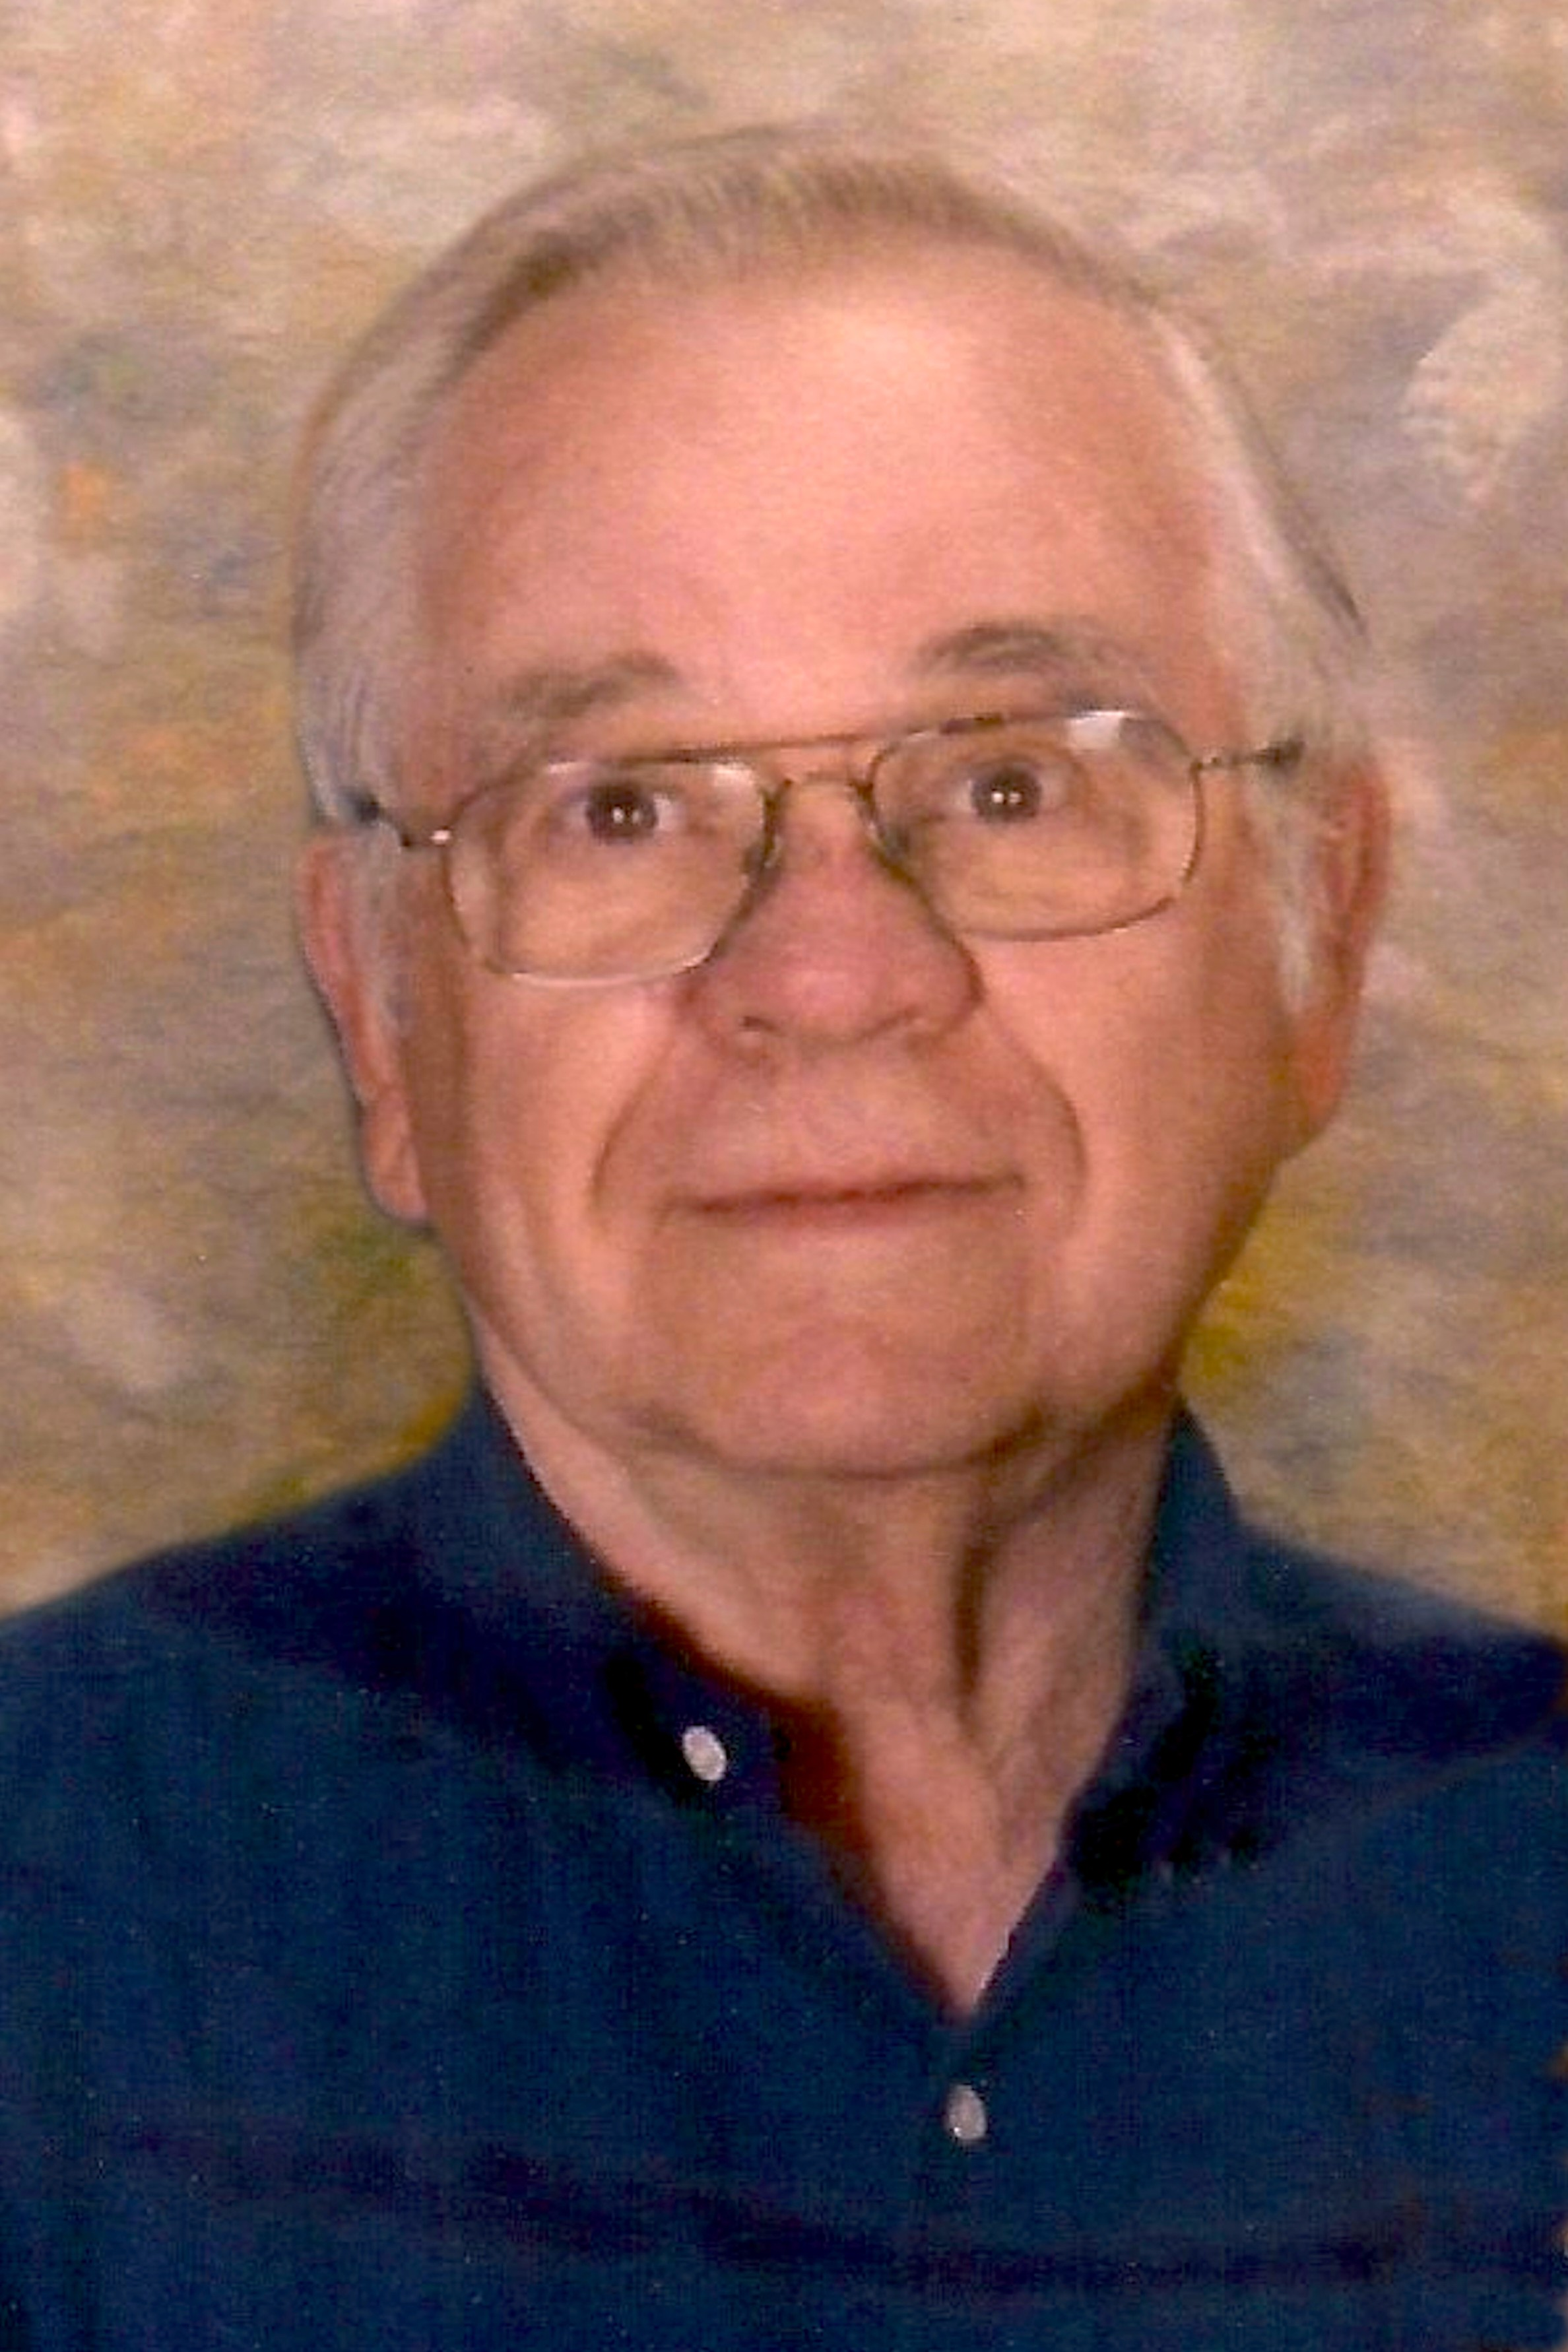 Ralph H. Baumert, age 76, of Dodge, Nebraska